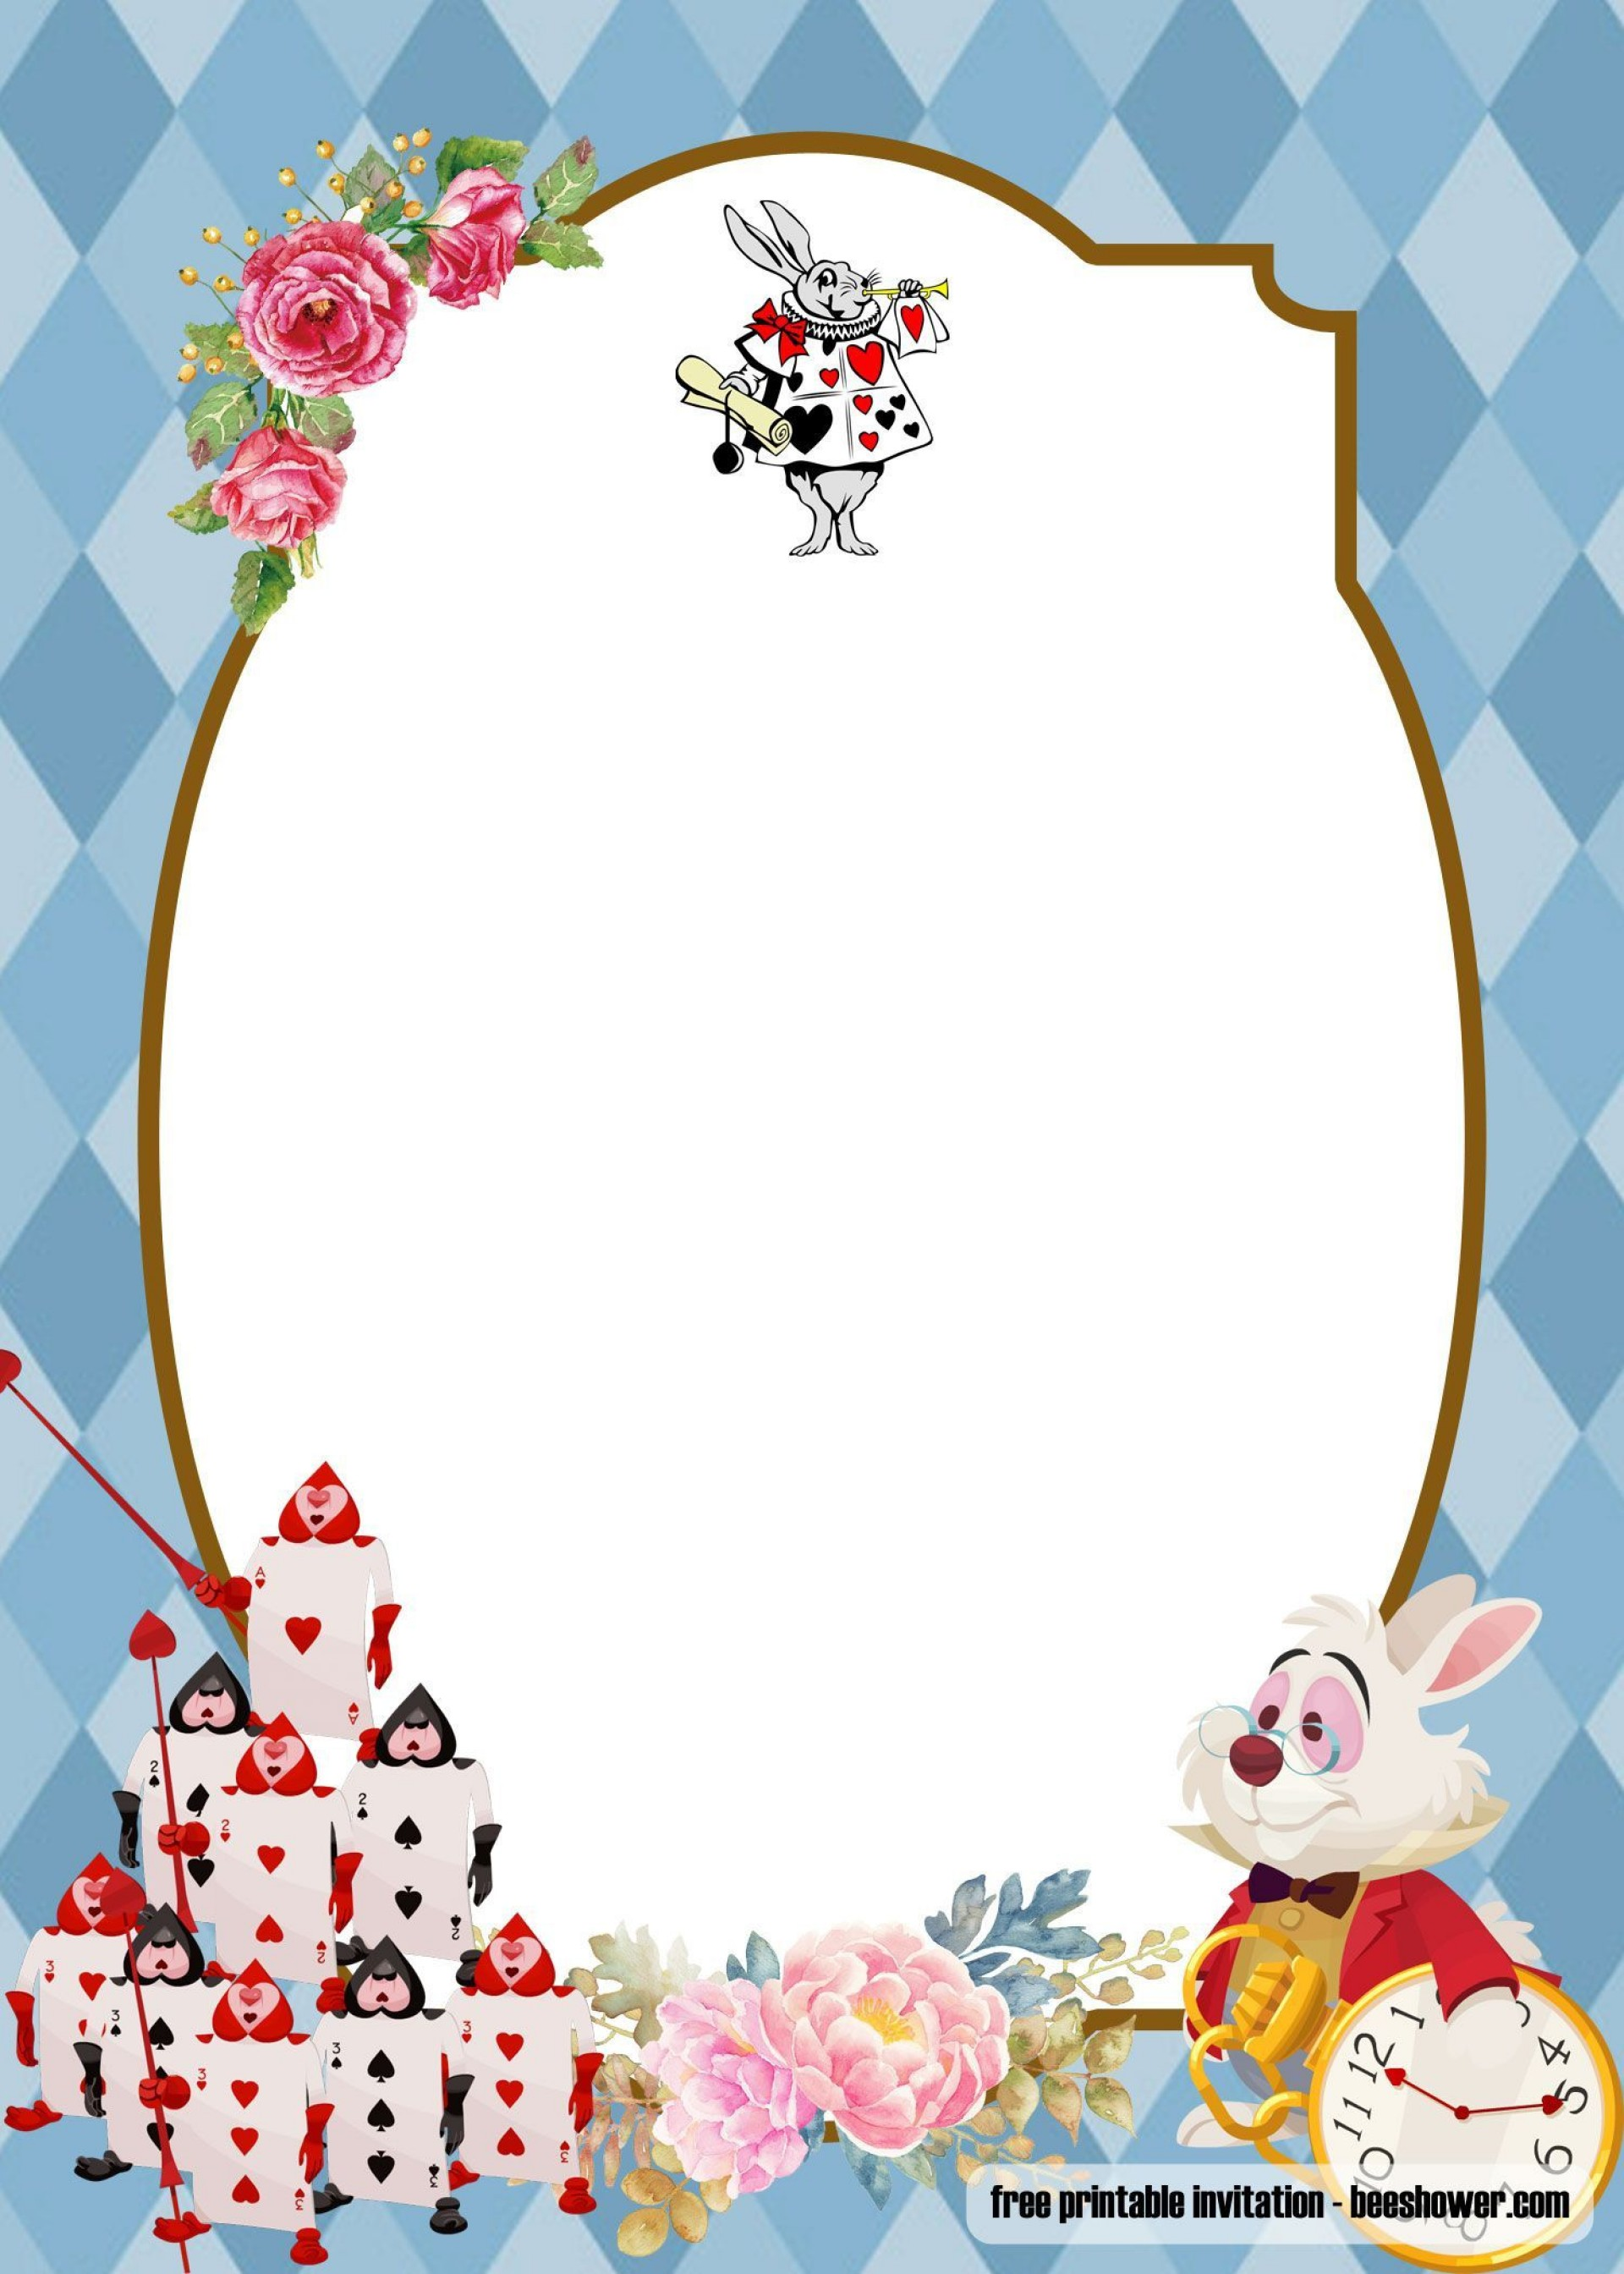 005 Fascinating Alice In Wonderland Invitation Template Download Design  Free1920